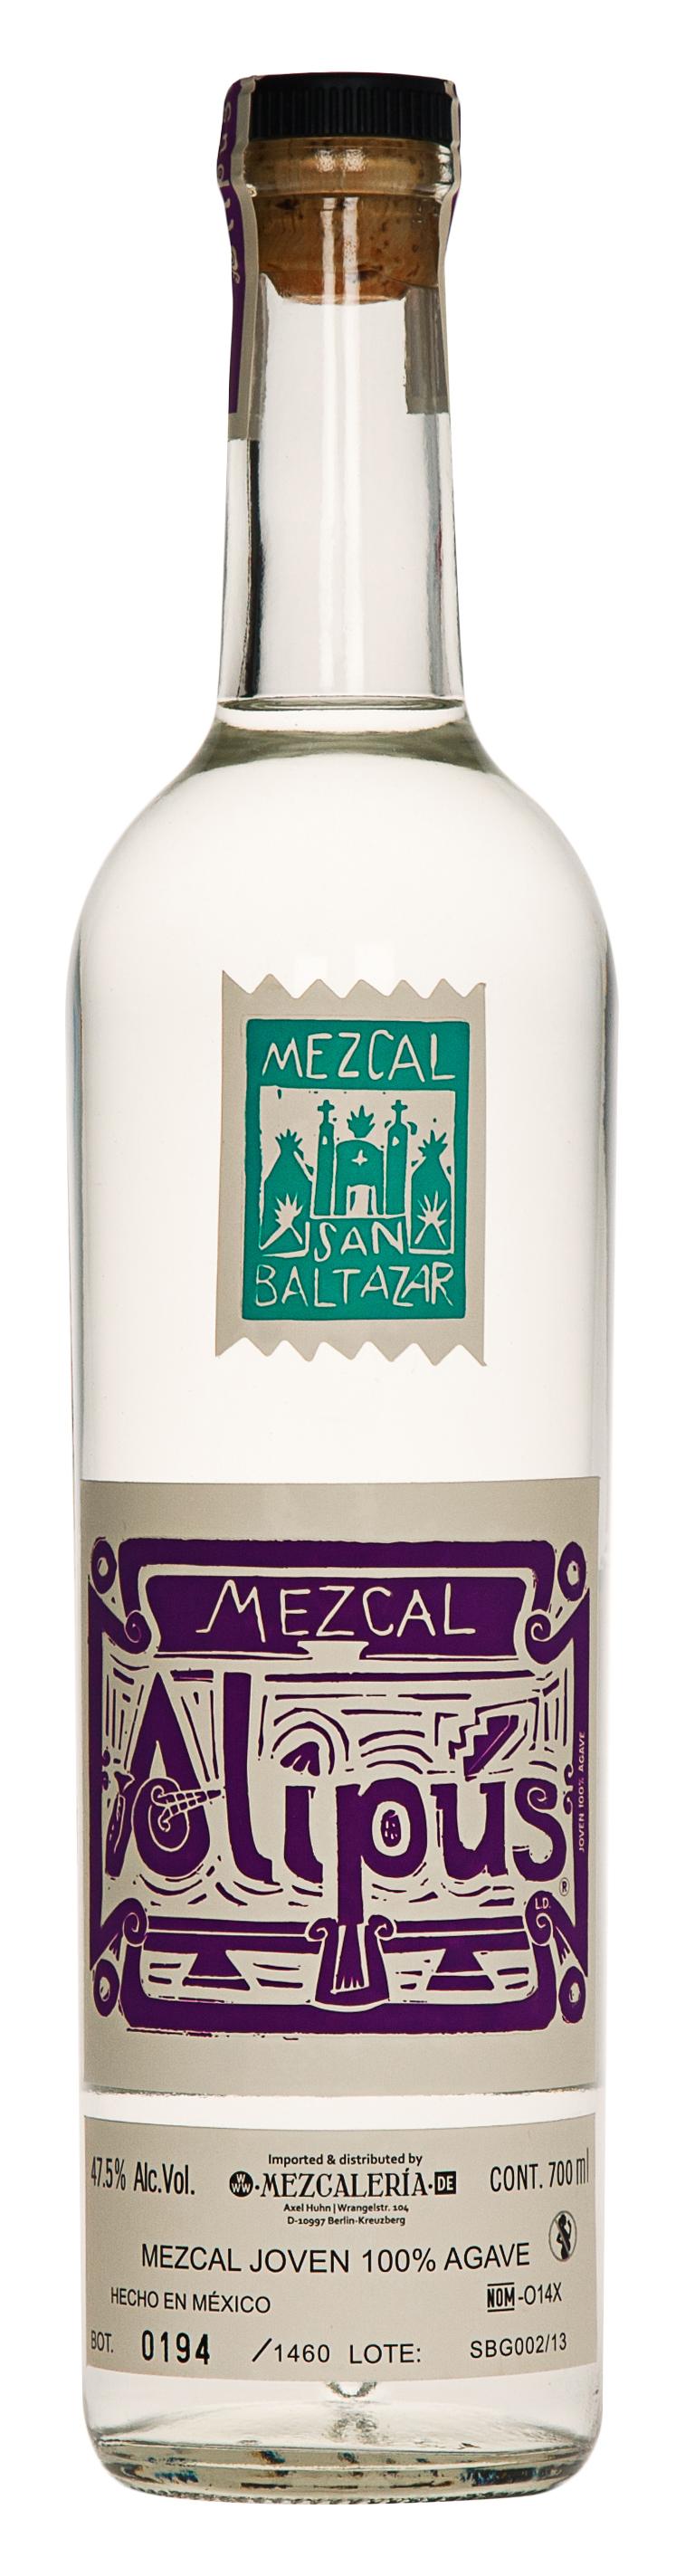 Alips San Baltazar Mezcal